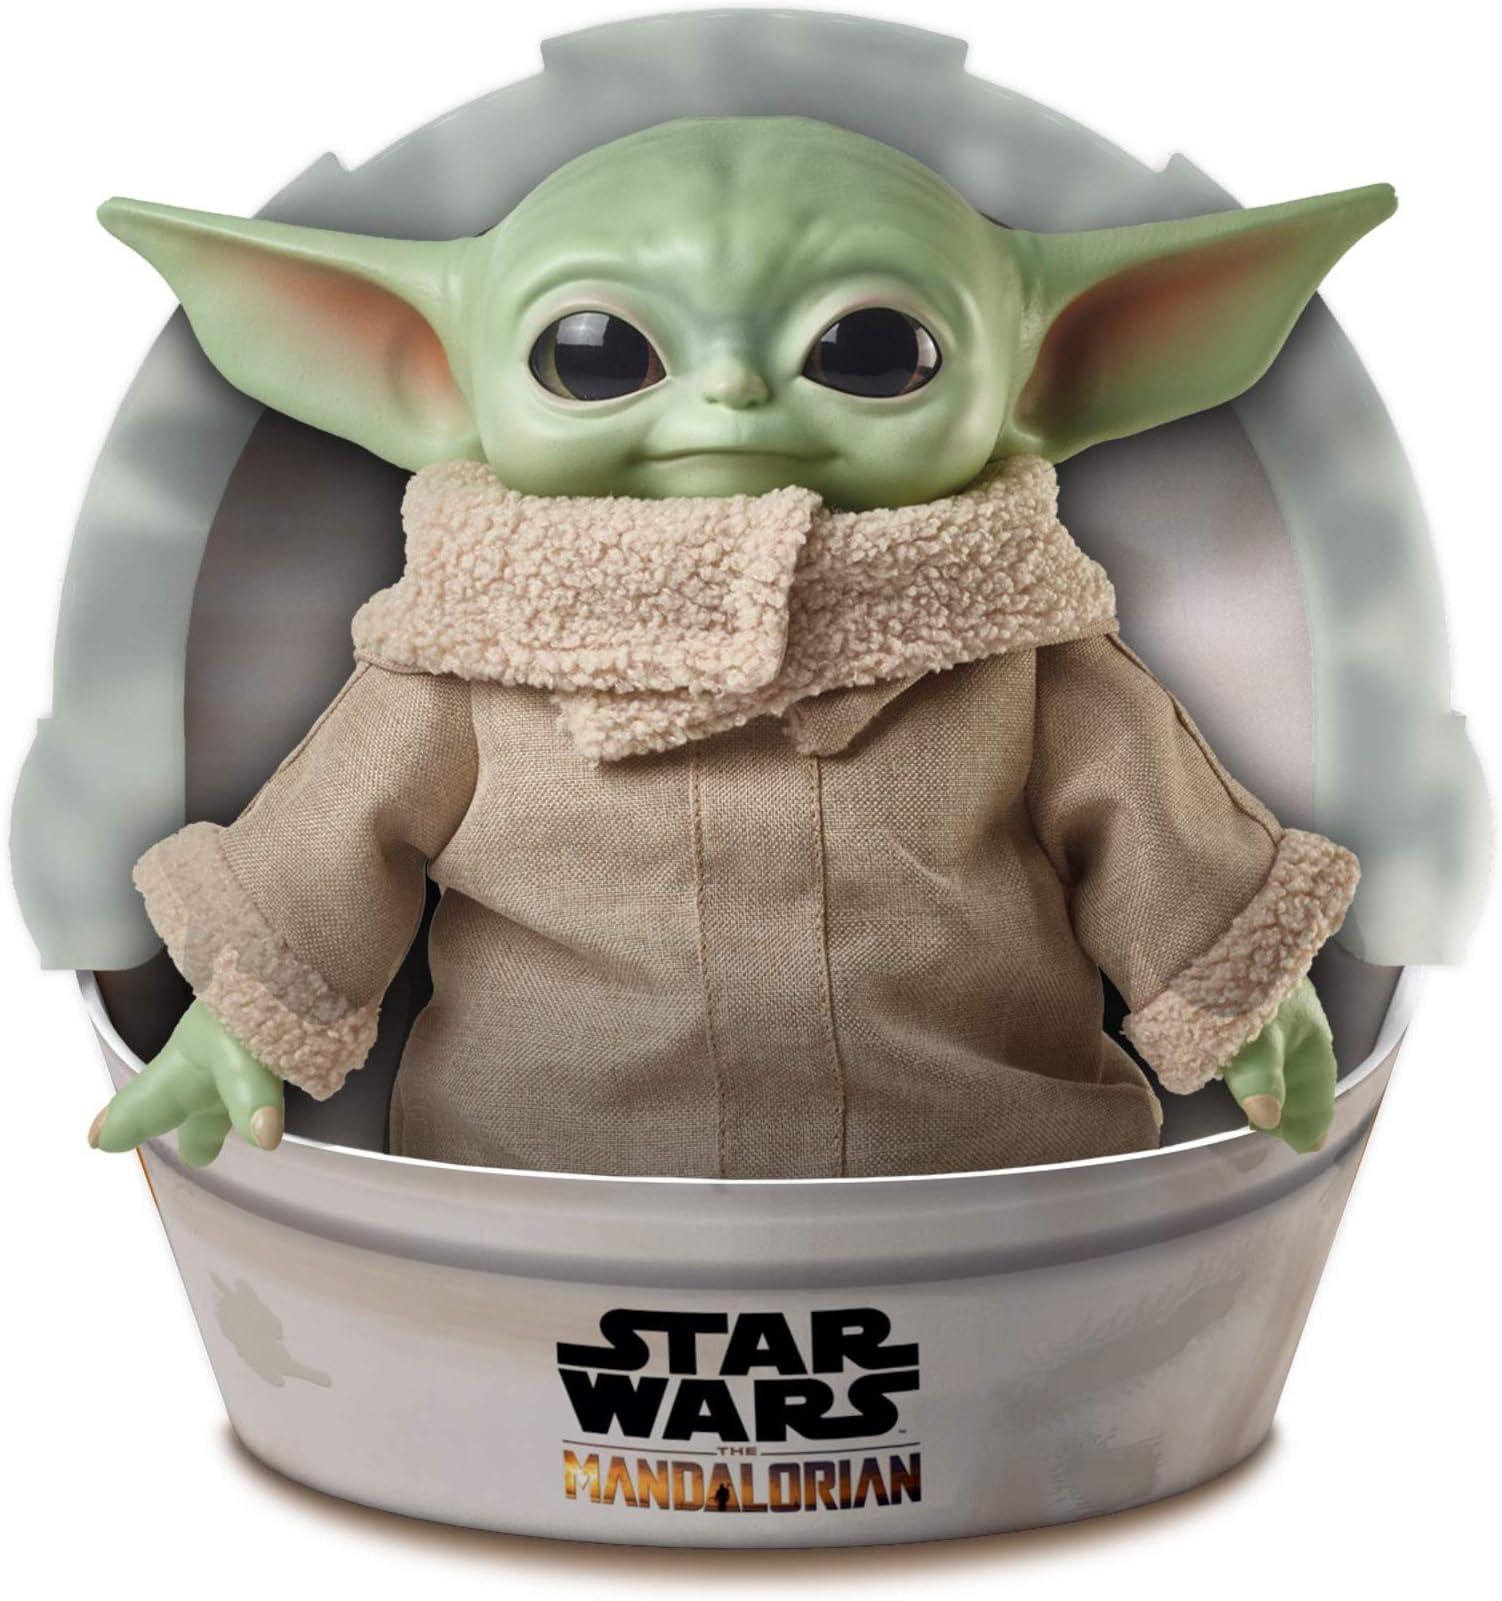 Star Wars Master Baby Yoda  Plush Toy Mandalorian Yoda Soft Stuffed Toys 20cm